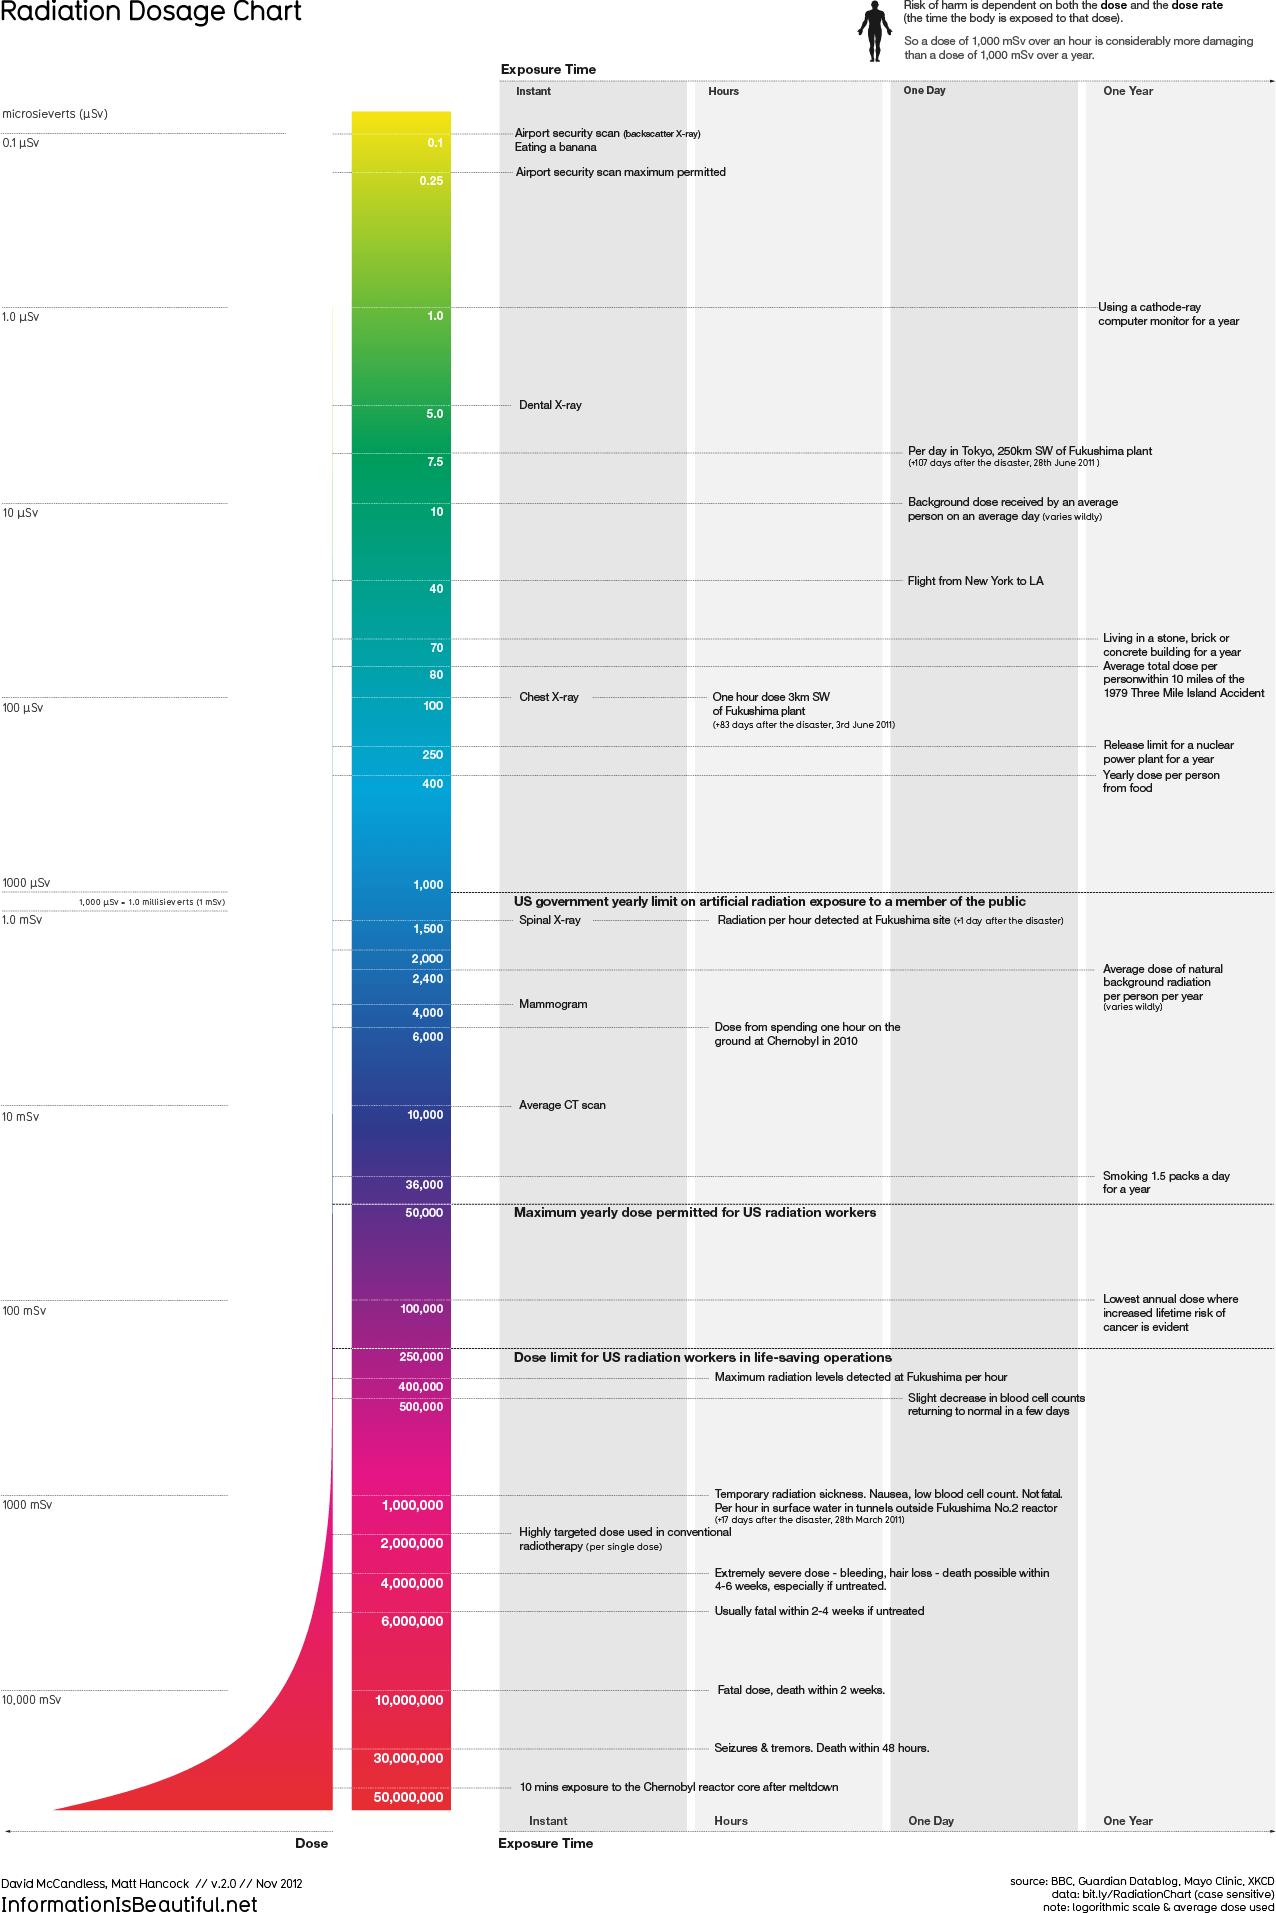 http://infobeautiful4.s3.amazonaws.com/2015/05/1276_radiation_chart.png